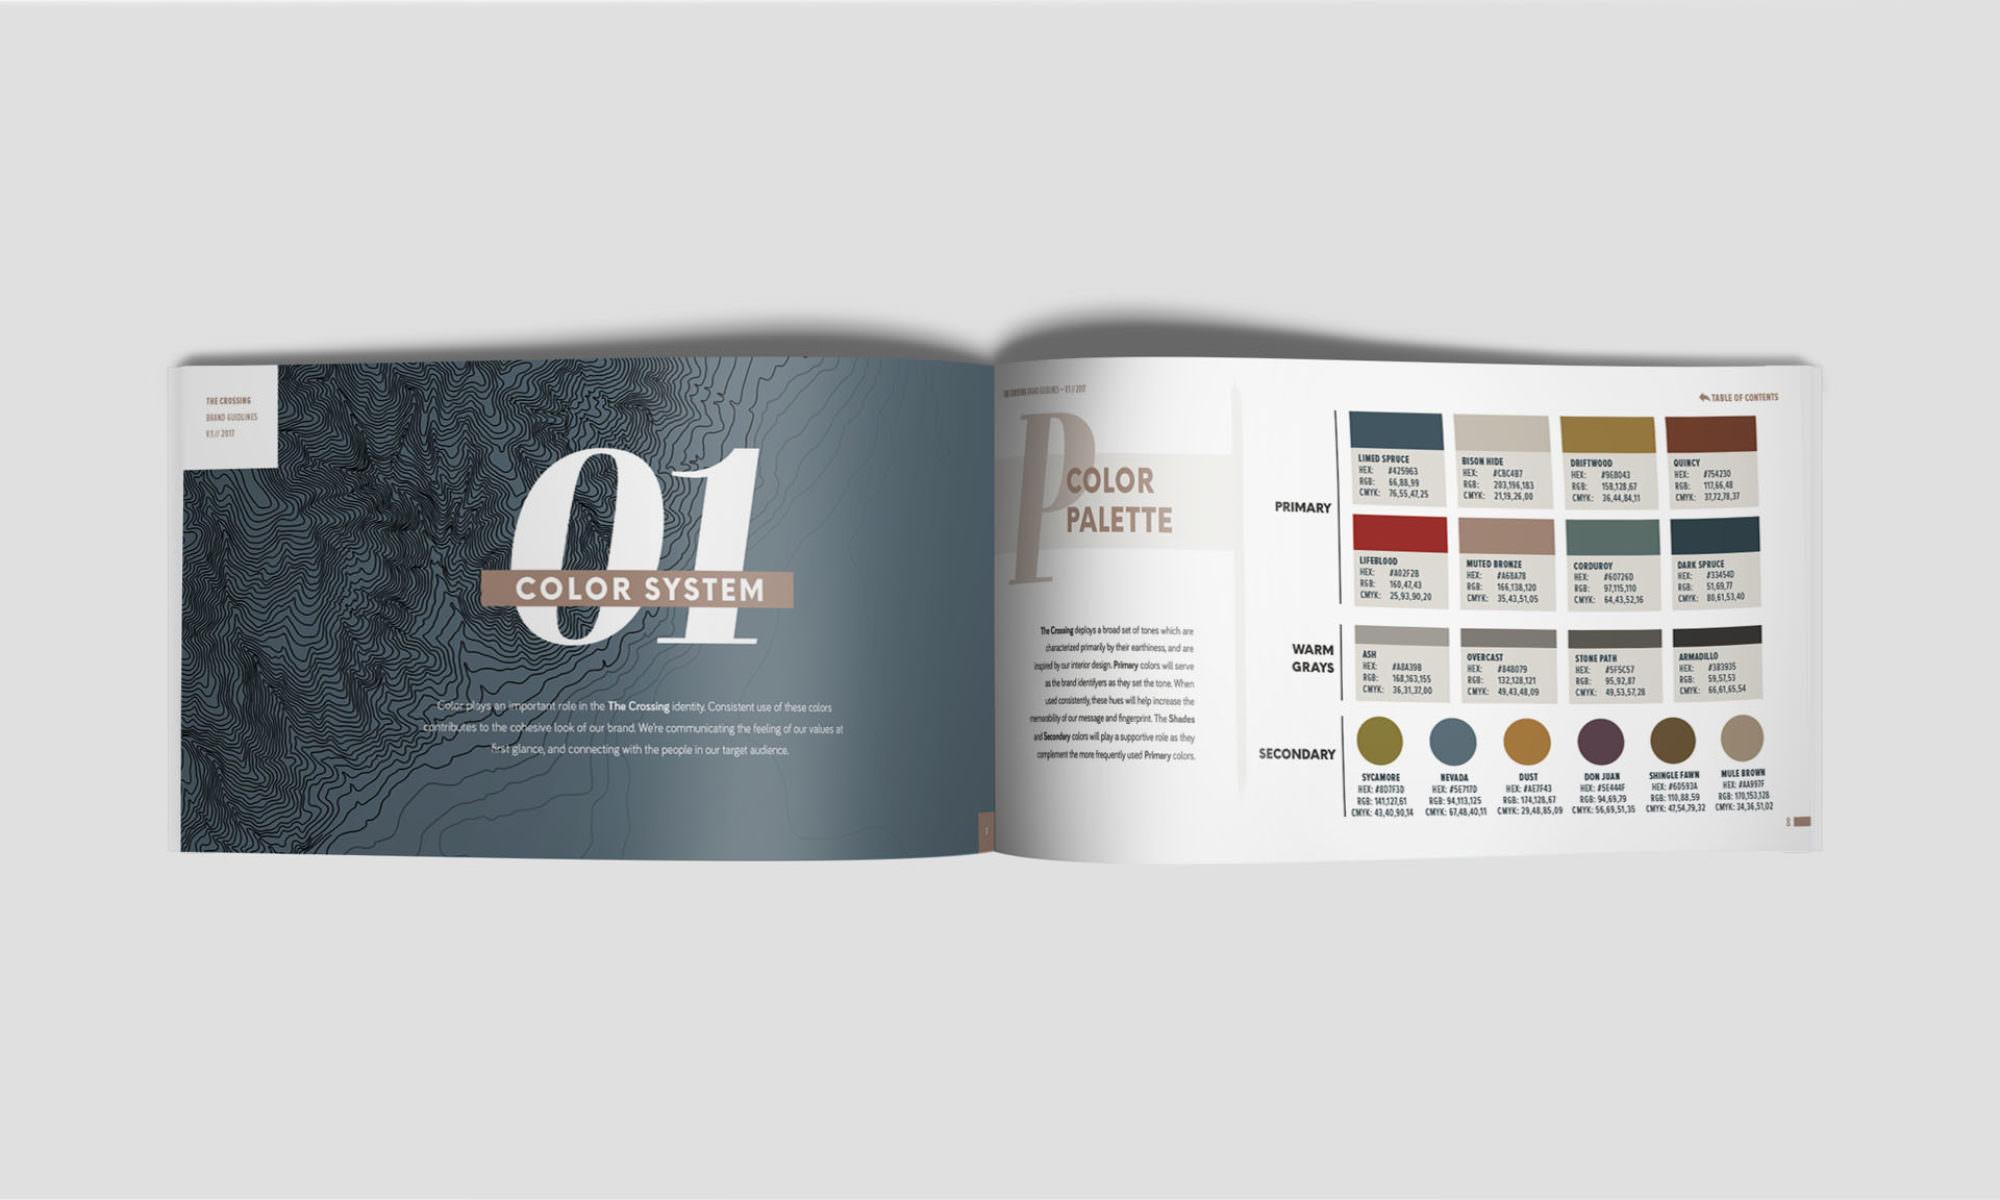 Mockup_Brand-Guide_Interior1-2000x0-c-default.jpg